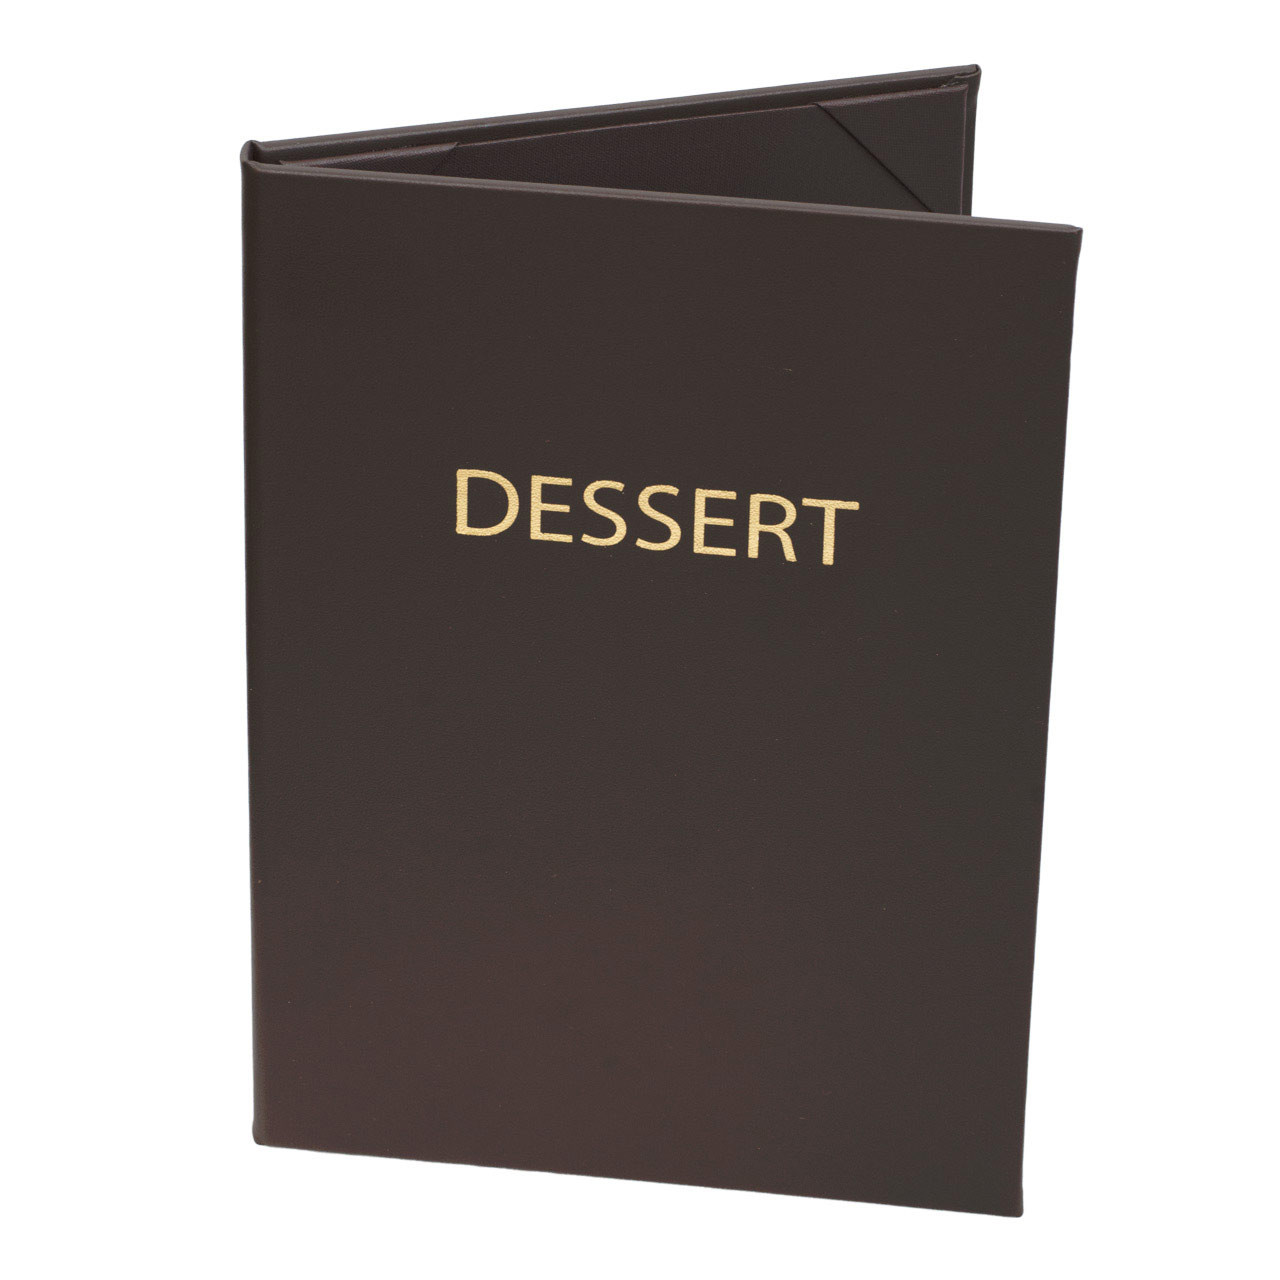 "5 1/2"" x 8 1/2"" Insert Menu Cover 2-panel chocolate brown"